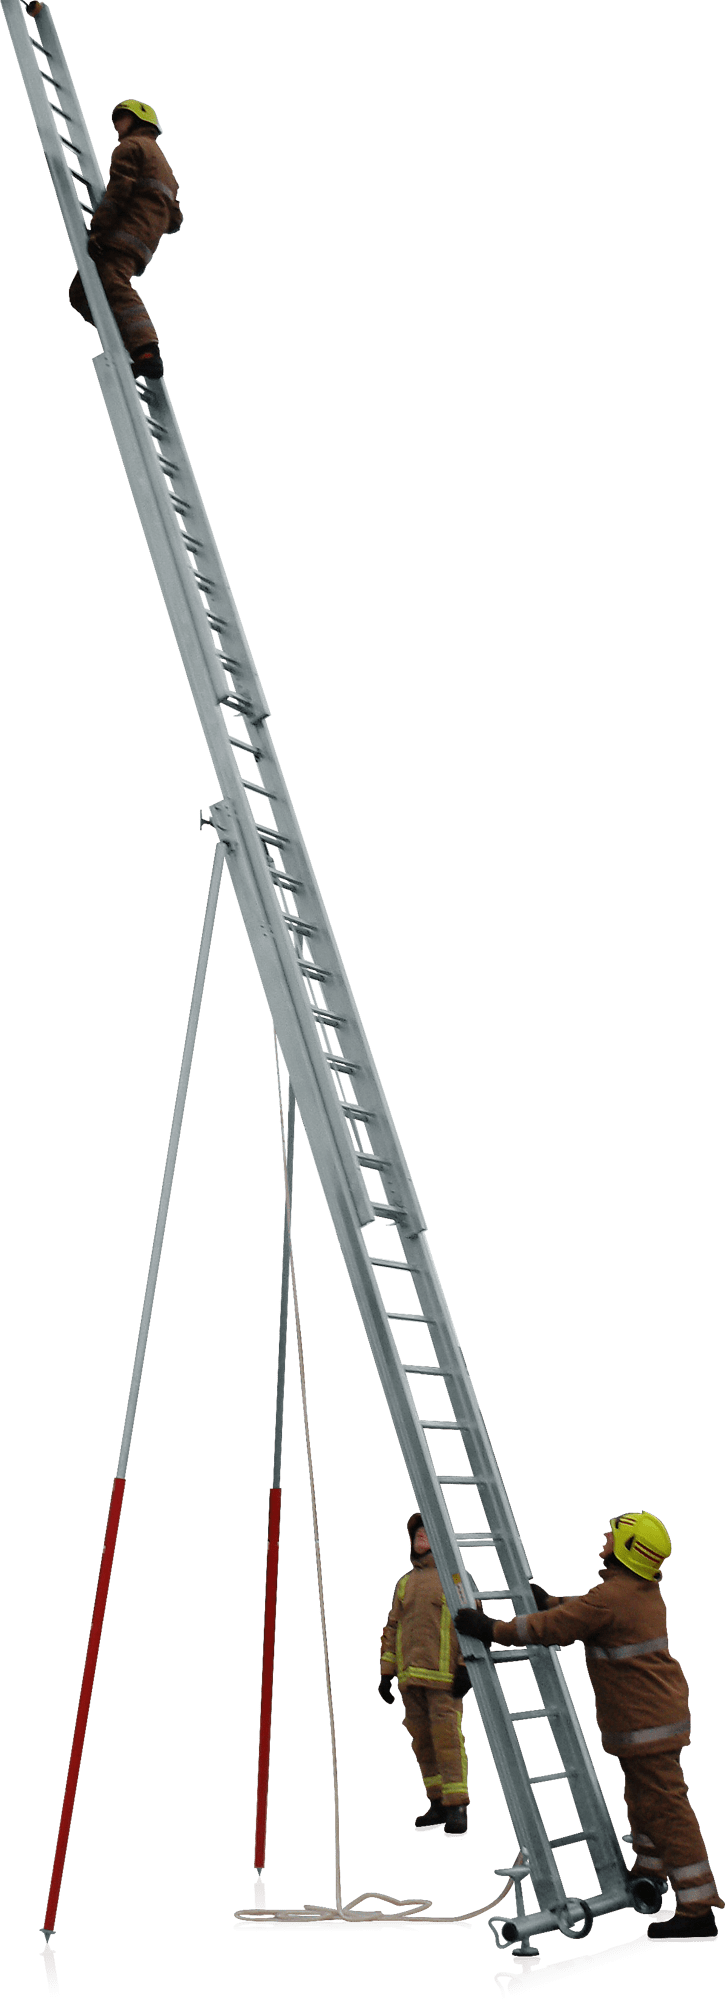 Výsuvný rebrík 3 dielny bez lanoťahu UK-TEP